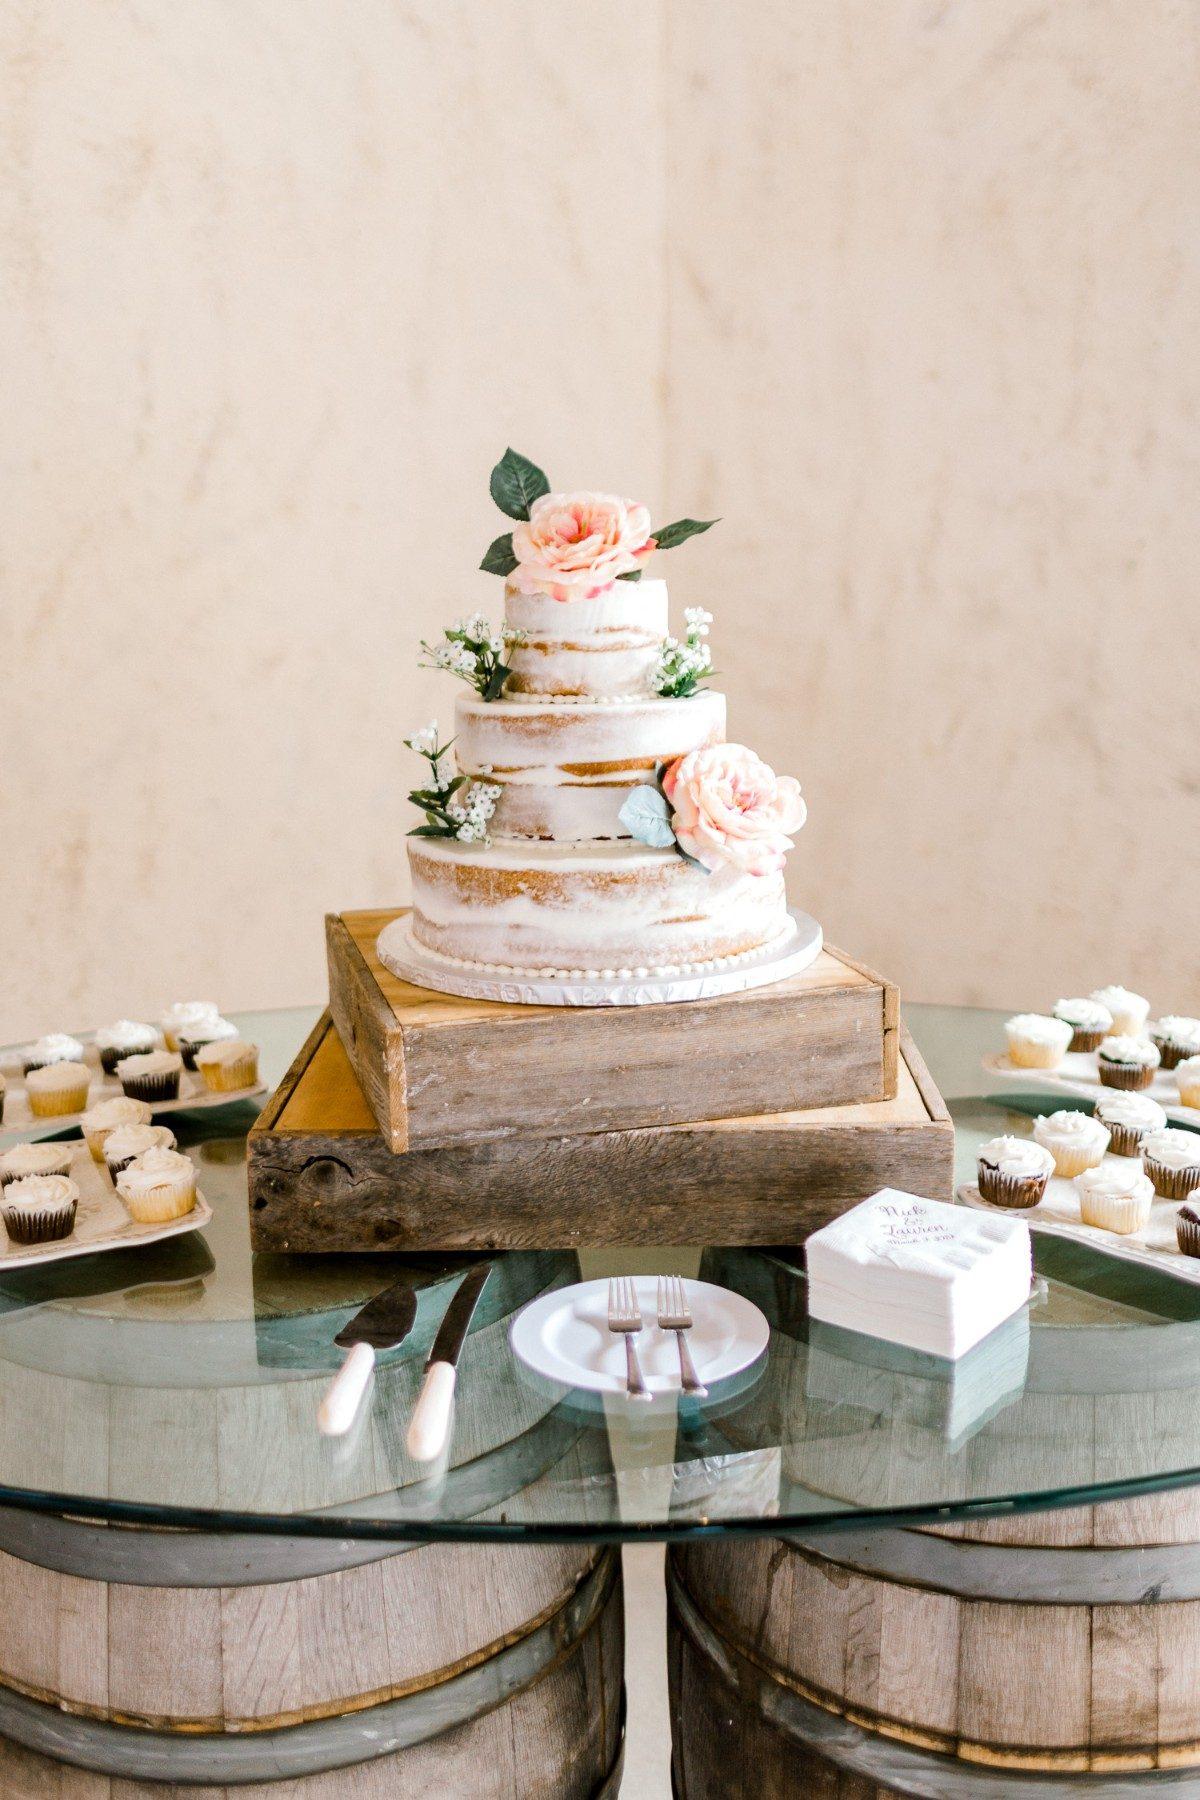 ennis-texas-wedding-photographer-kaitlyn-bullard-54.jpg